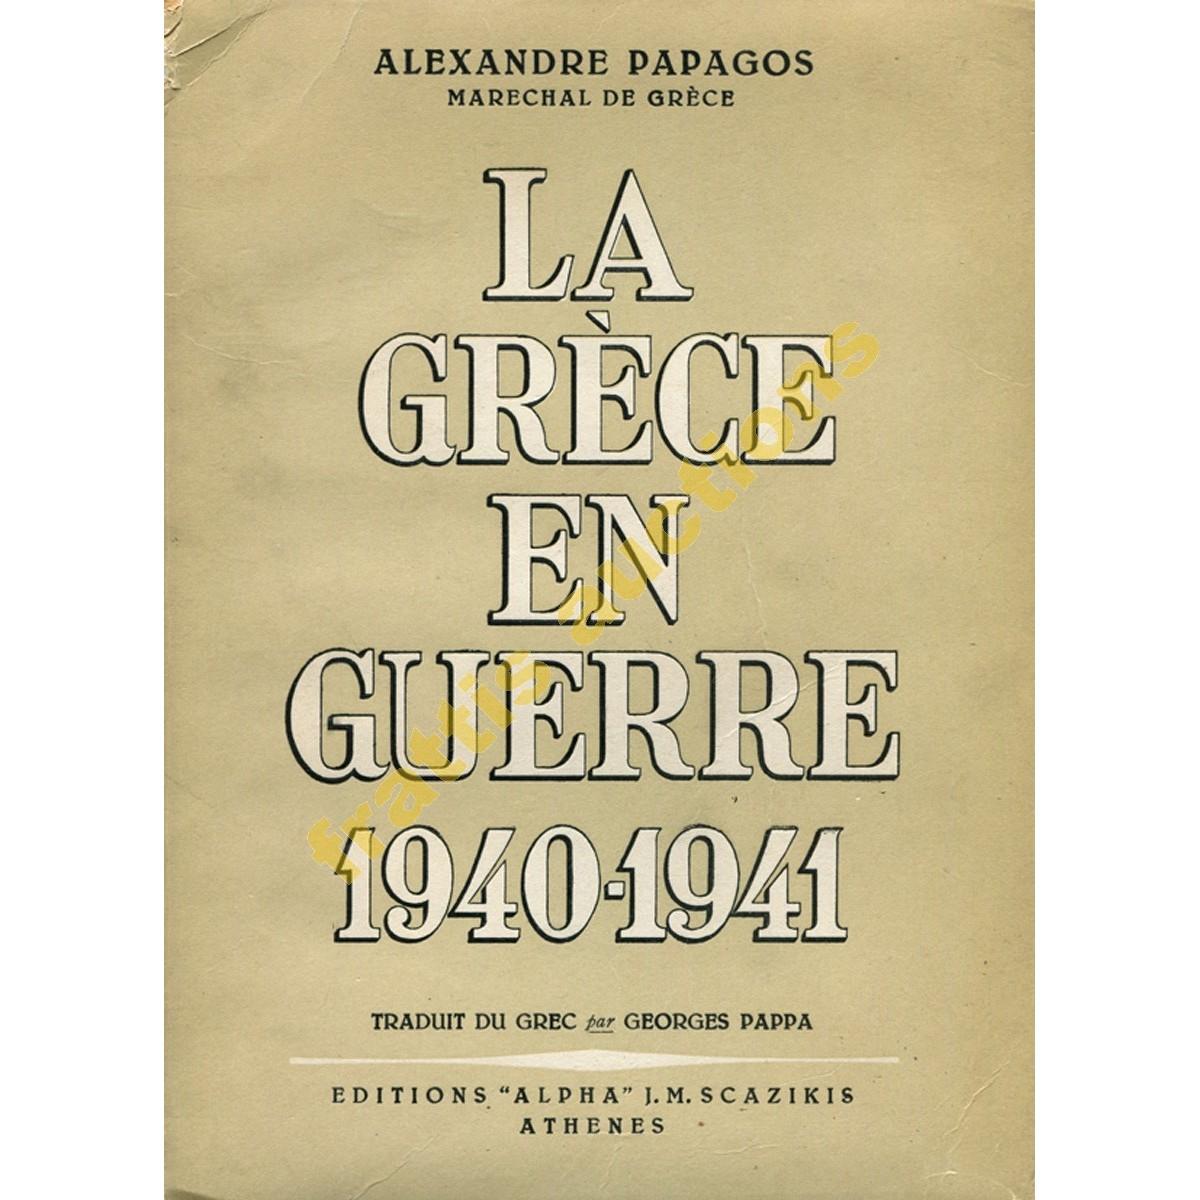 PAPAGOS ALEXANDRE